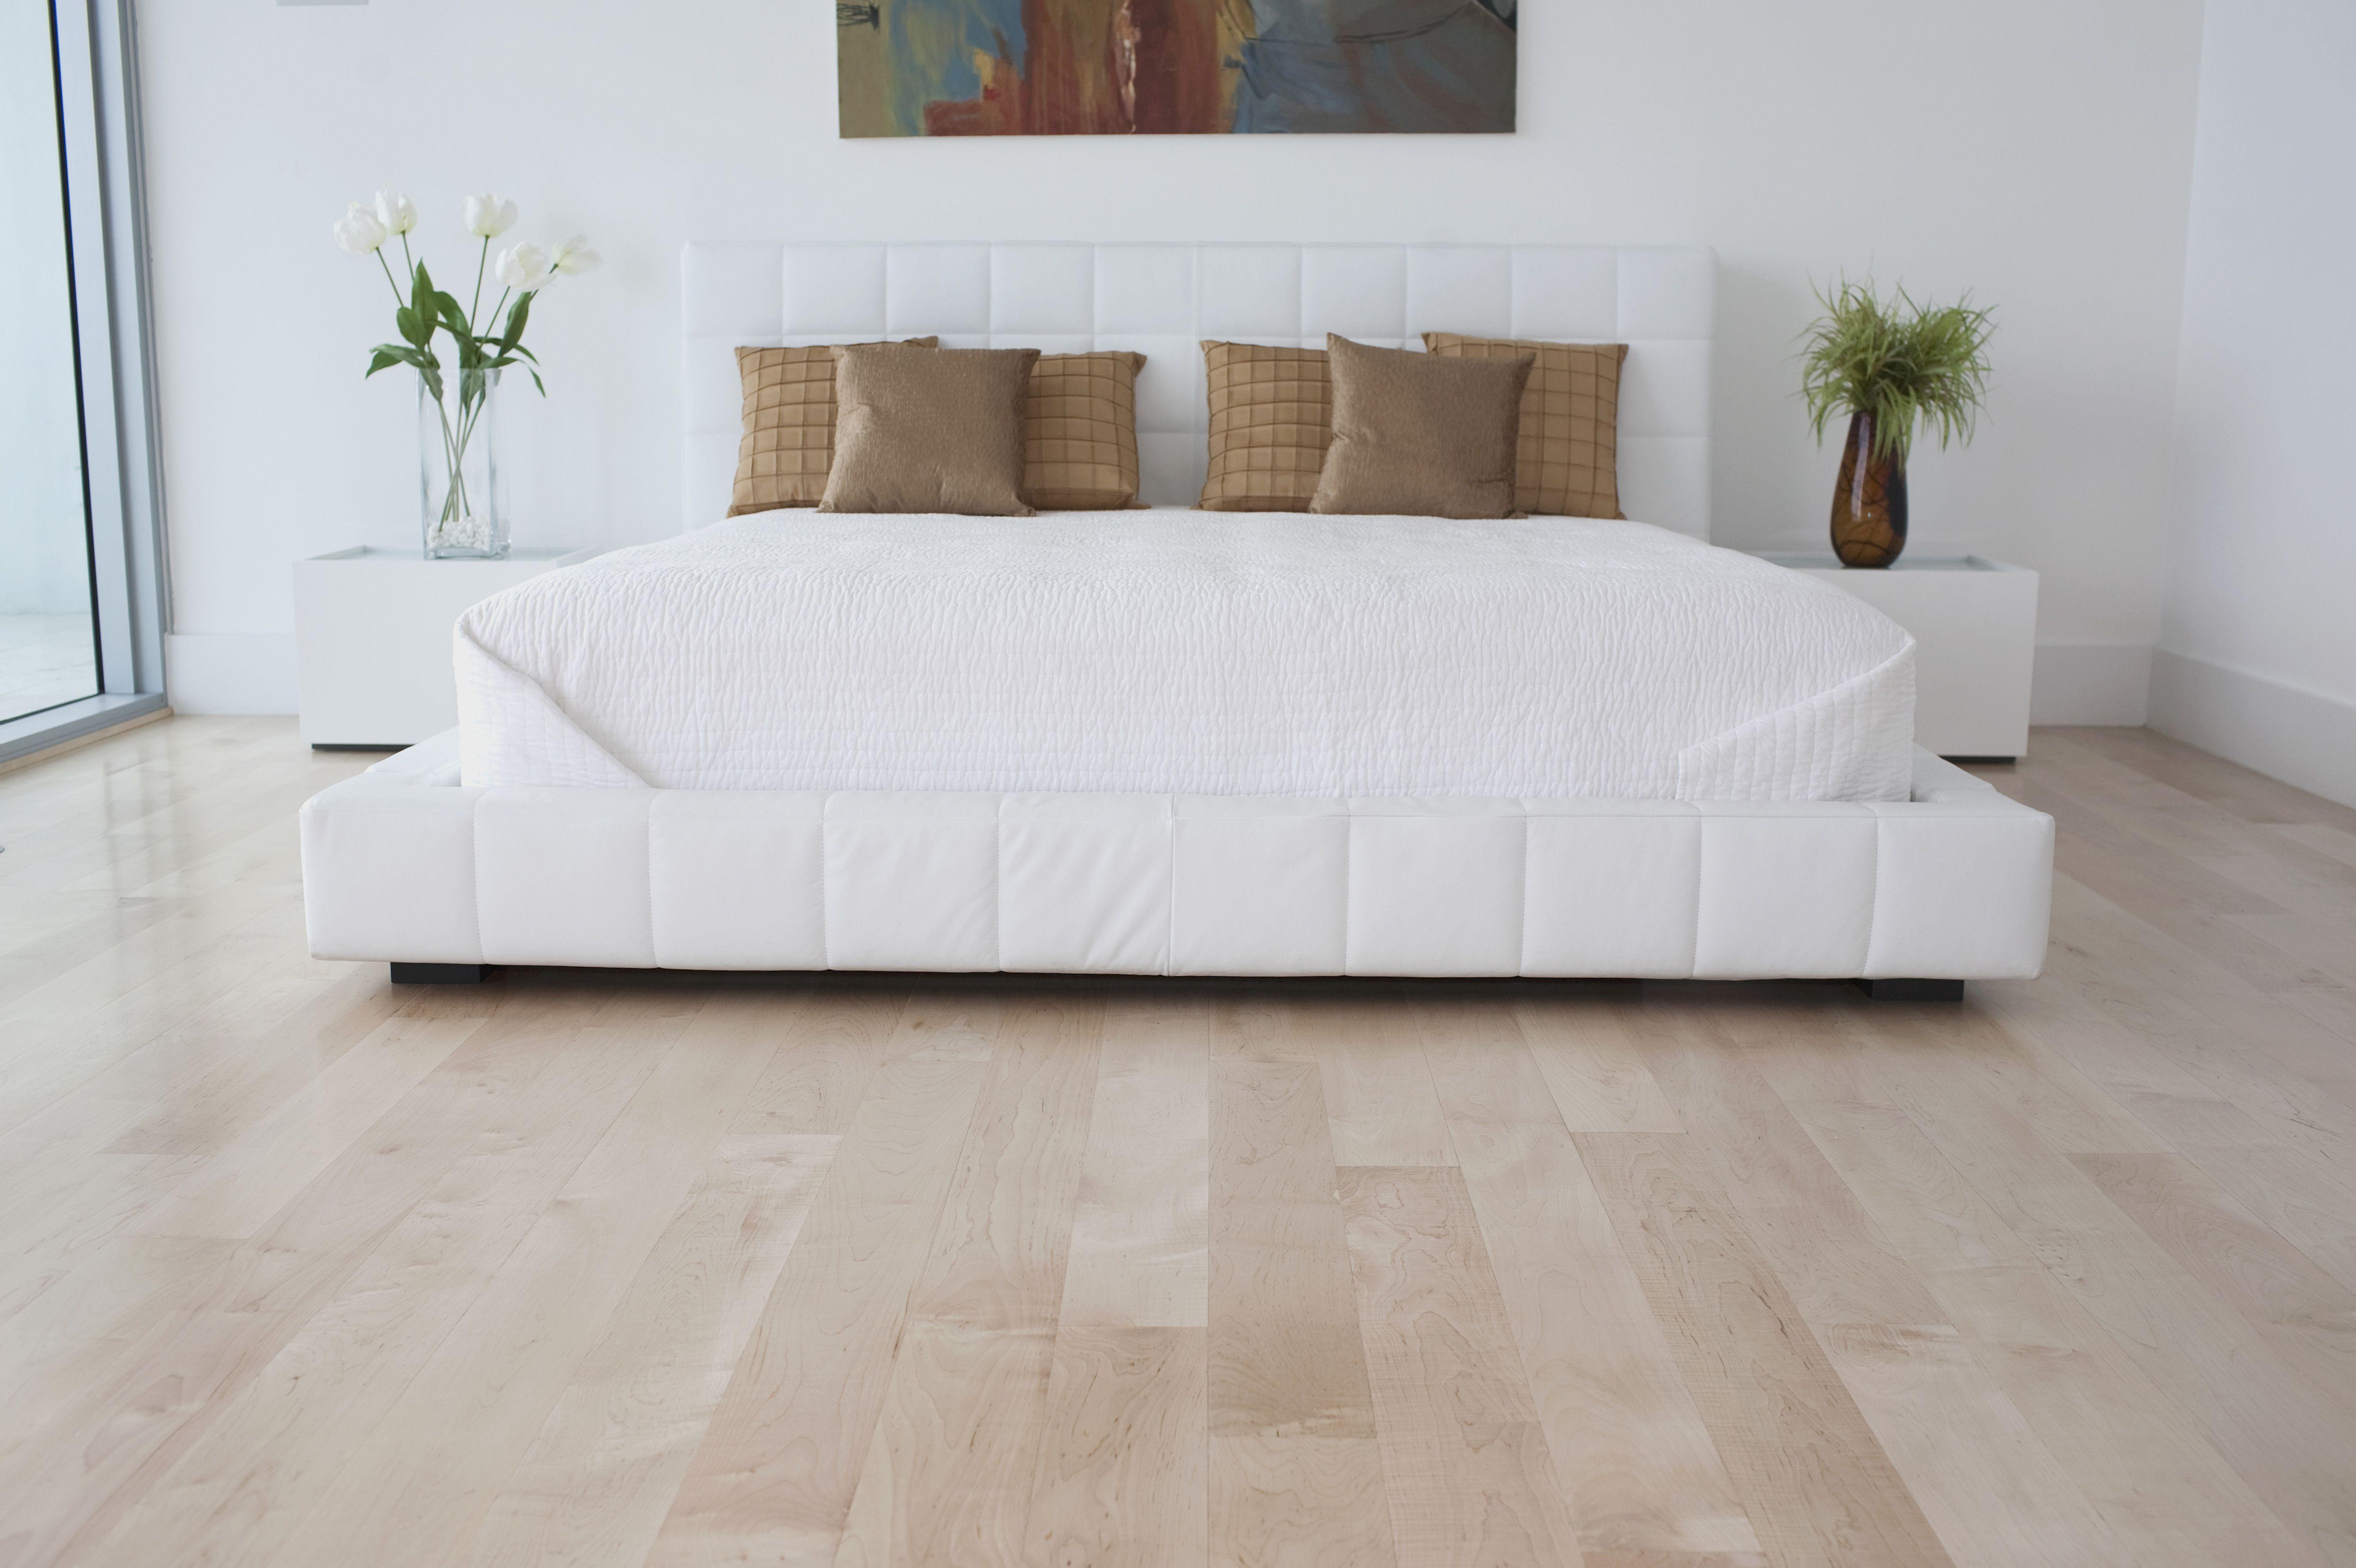 Why Should I Choose Laminate Flooring?